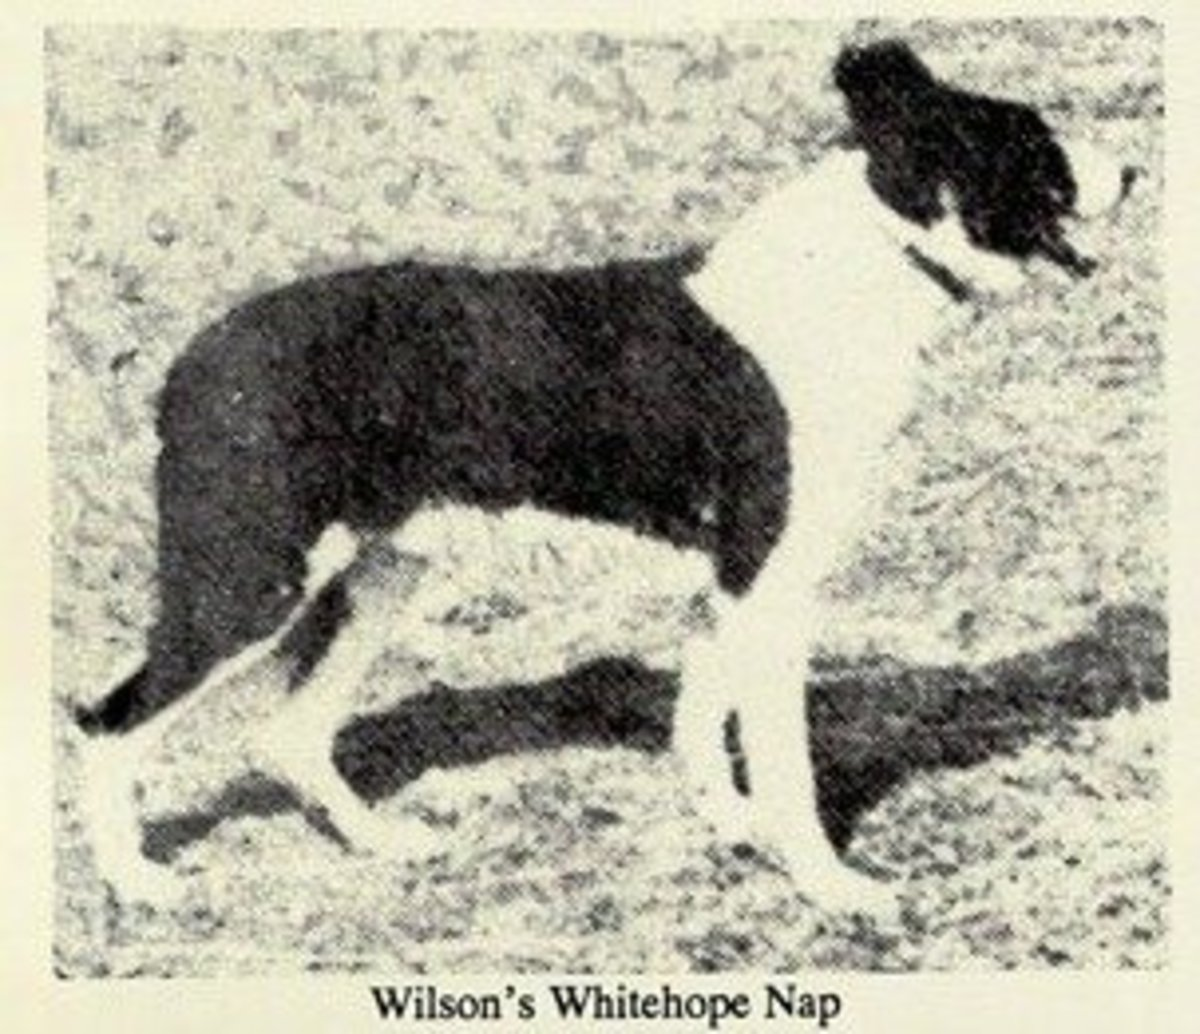 Whitehope Nap.